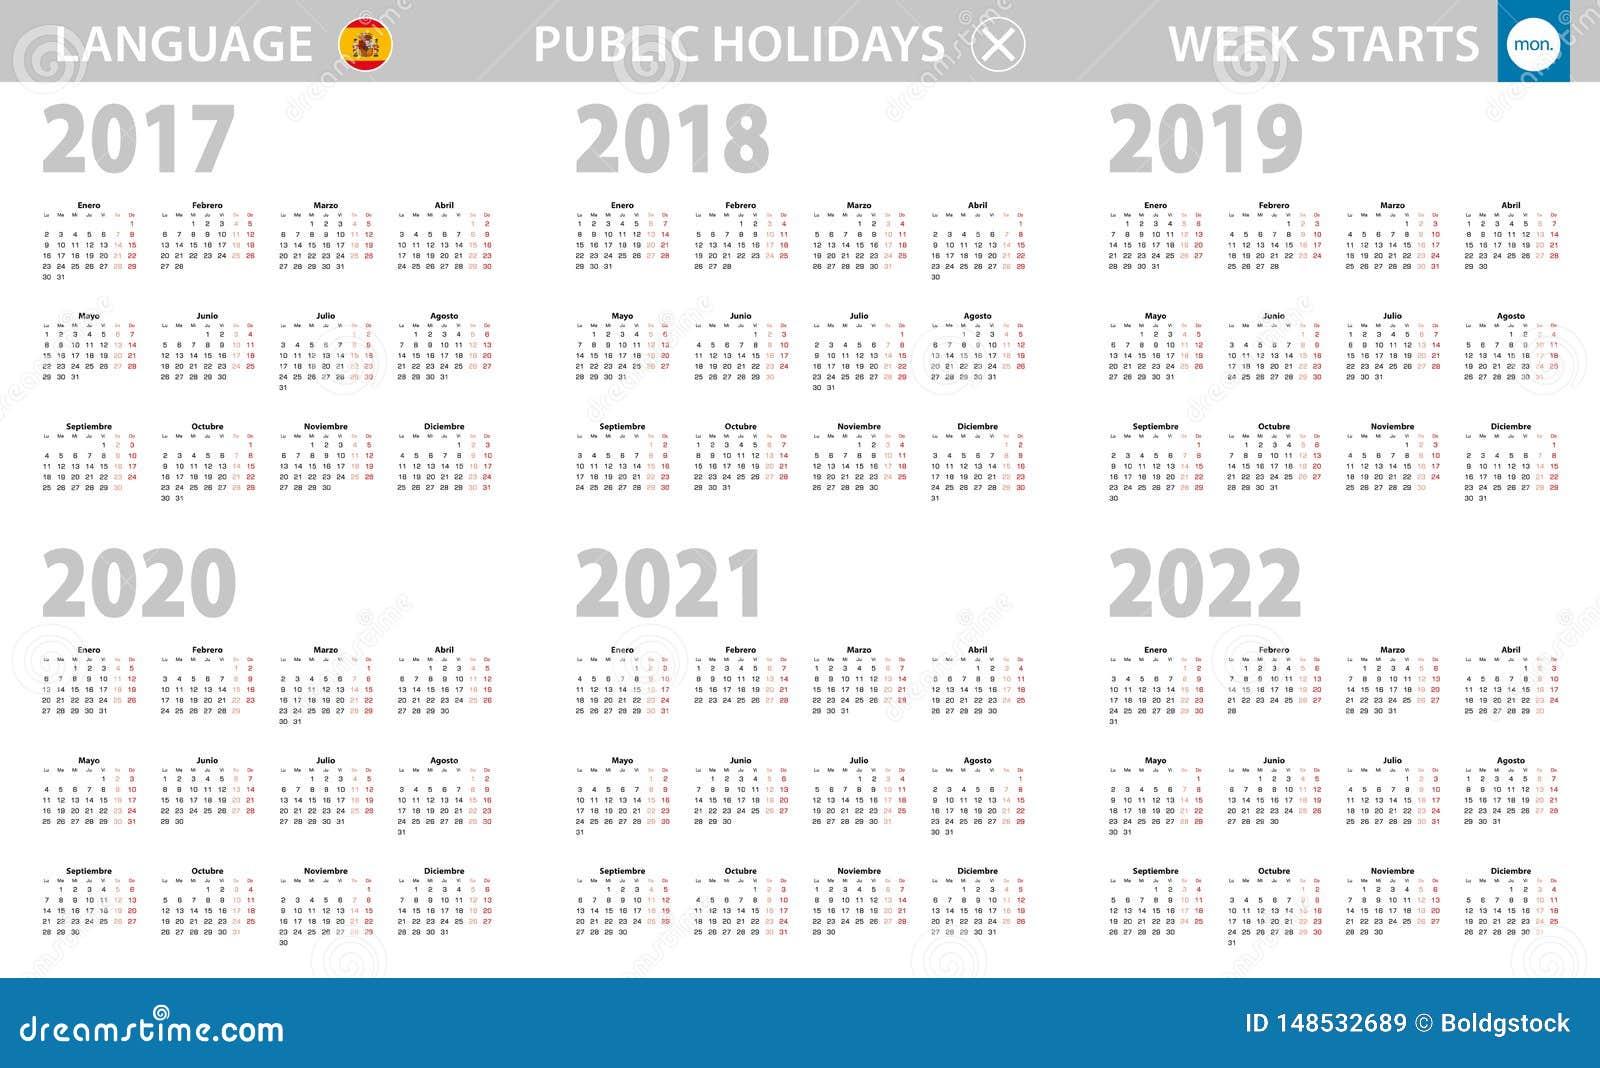 Spanish Calendar 2022.Calendar In Spanish Language For Year 2017 2022 Week Starts From Monday Stock Vector Illustration Of 2022 Latin 148532689